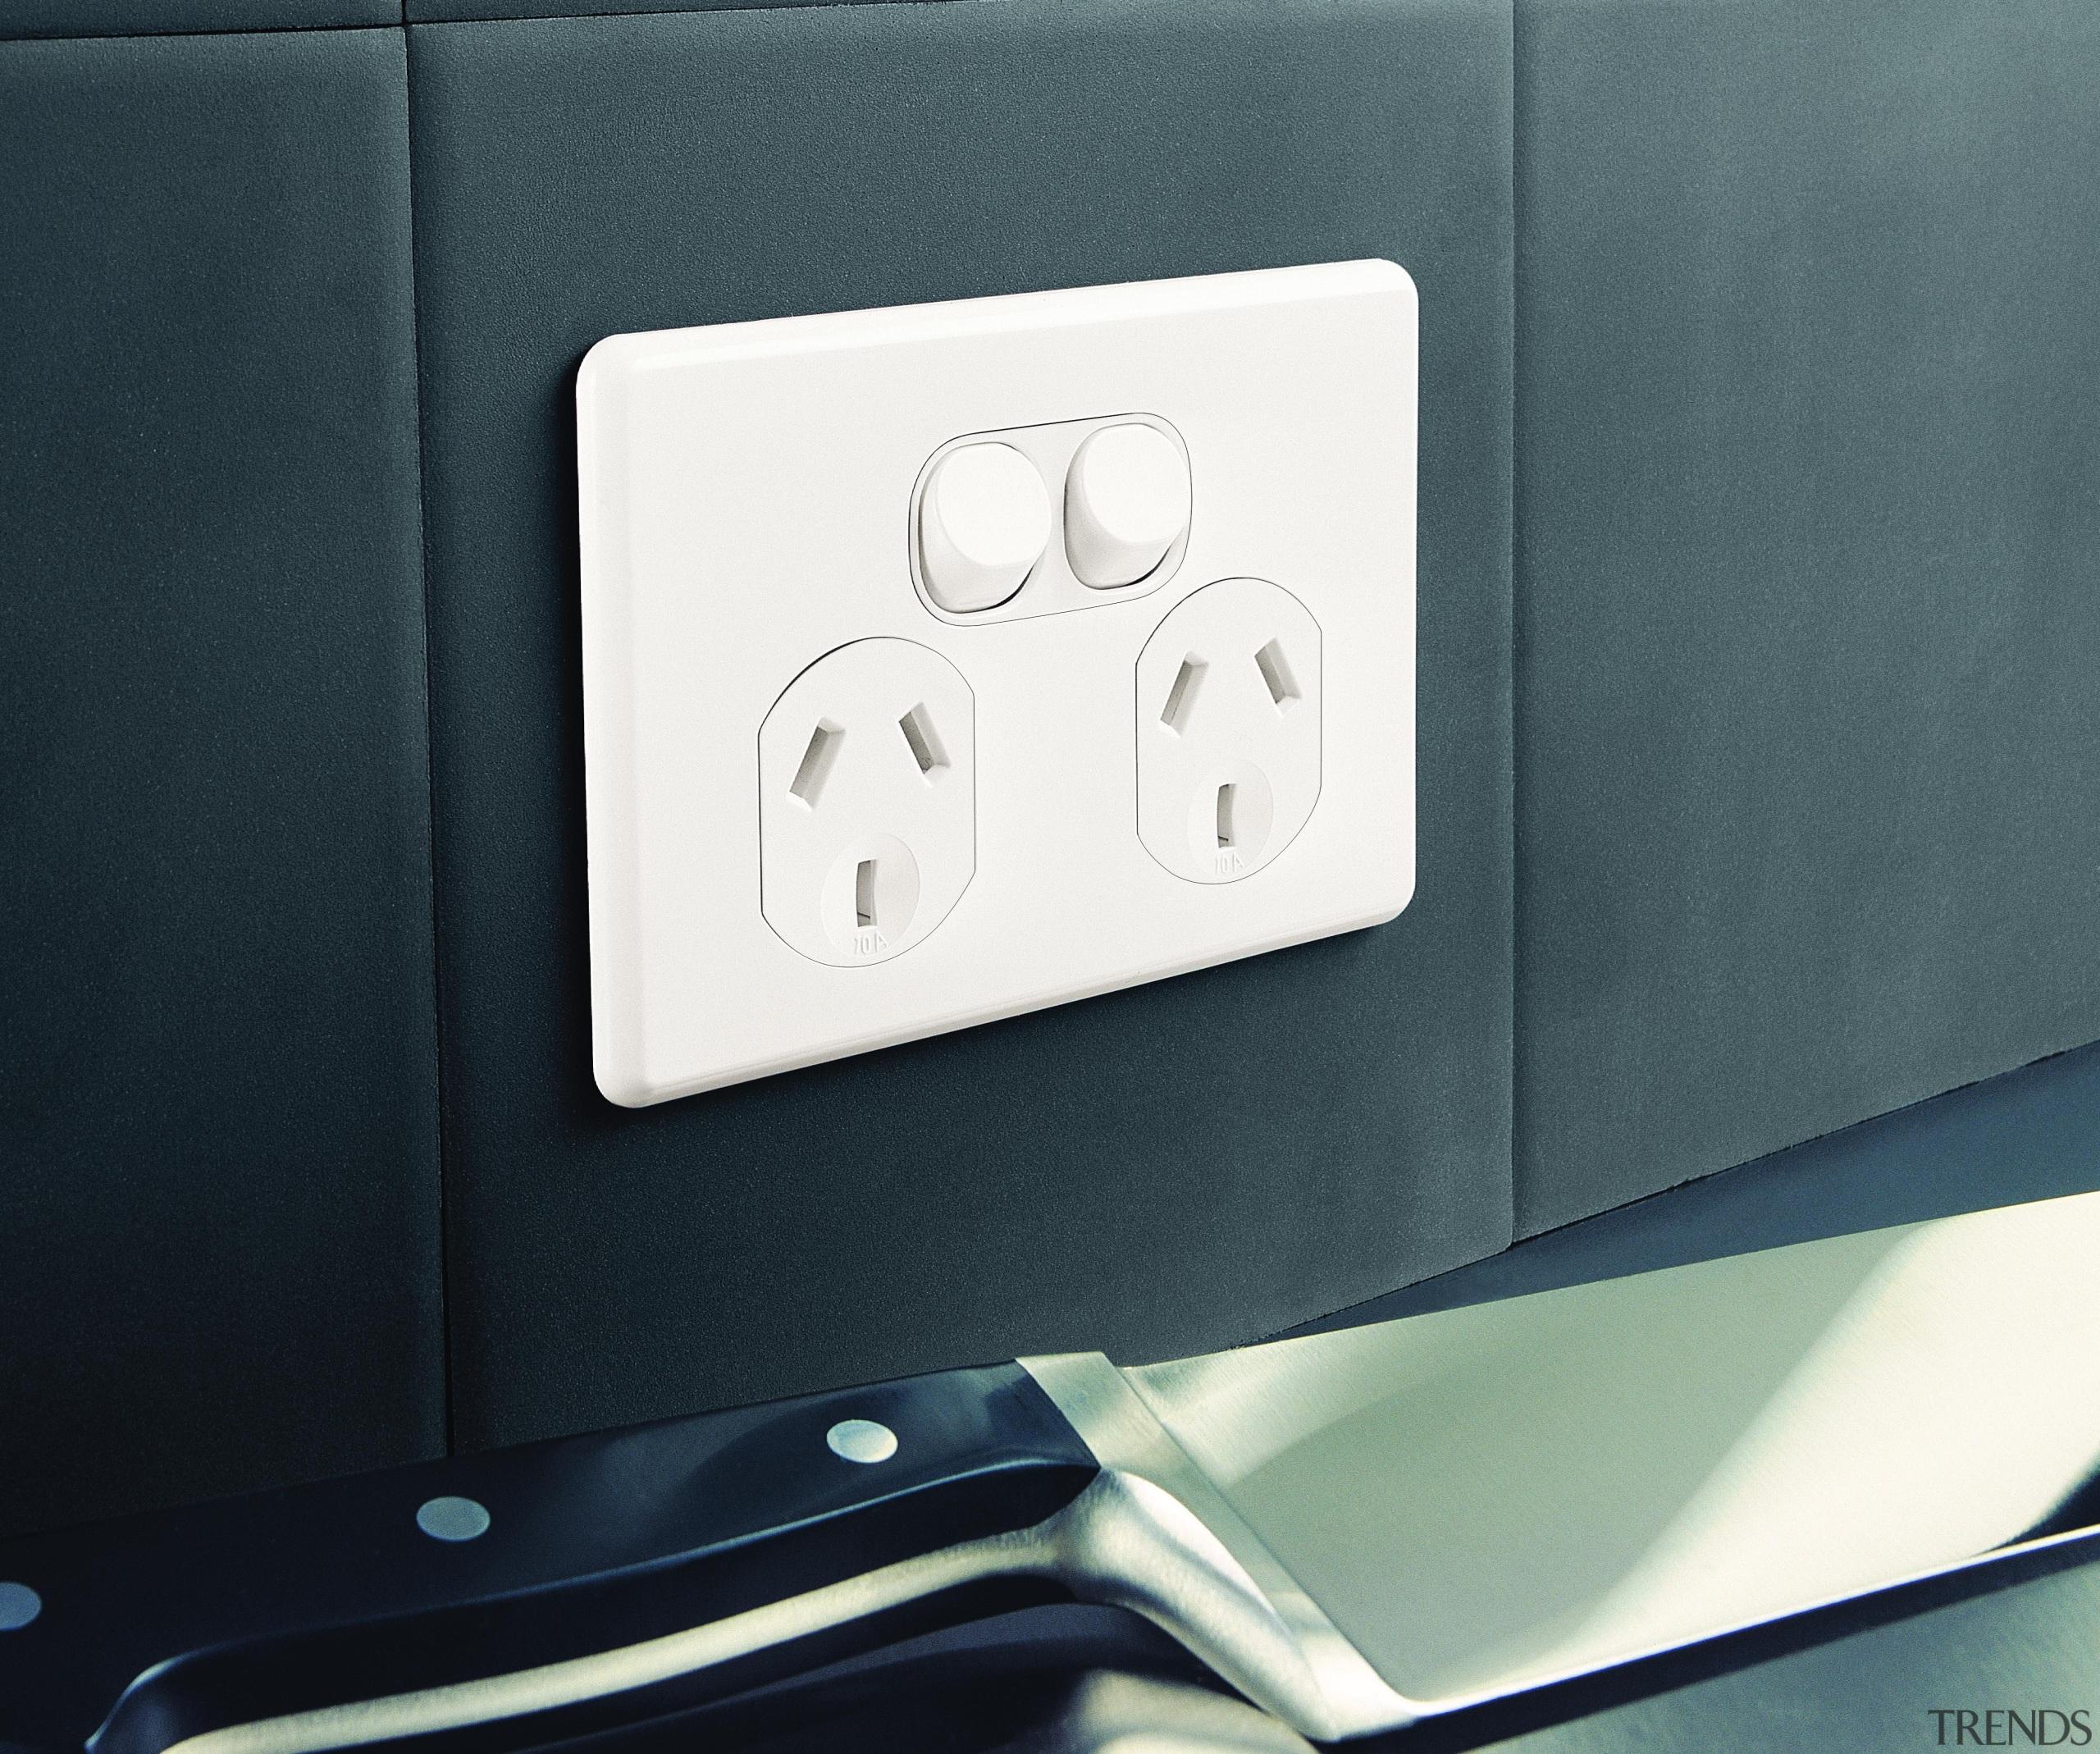 Slimline double socket - Slimline double socket - product, technology, black, gray